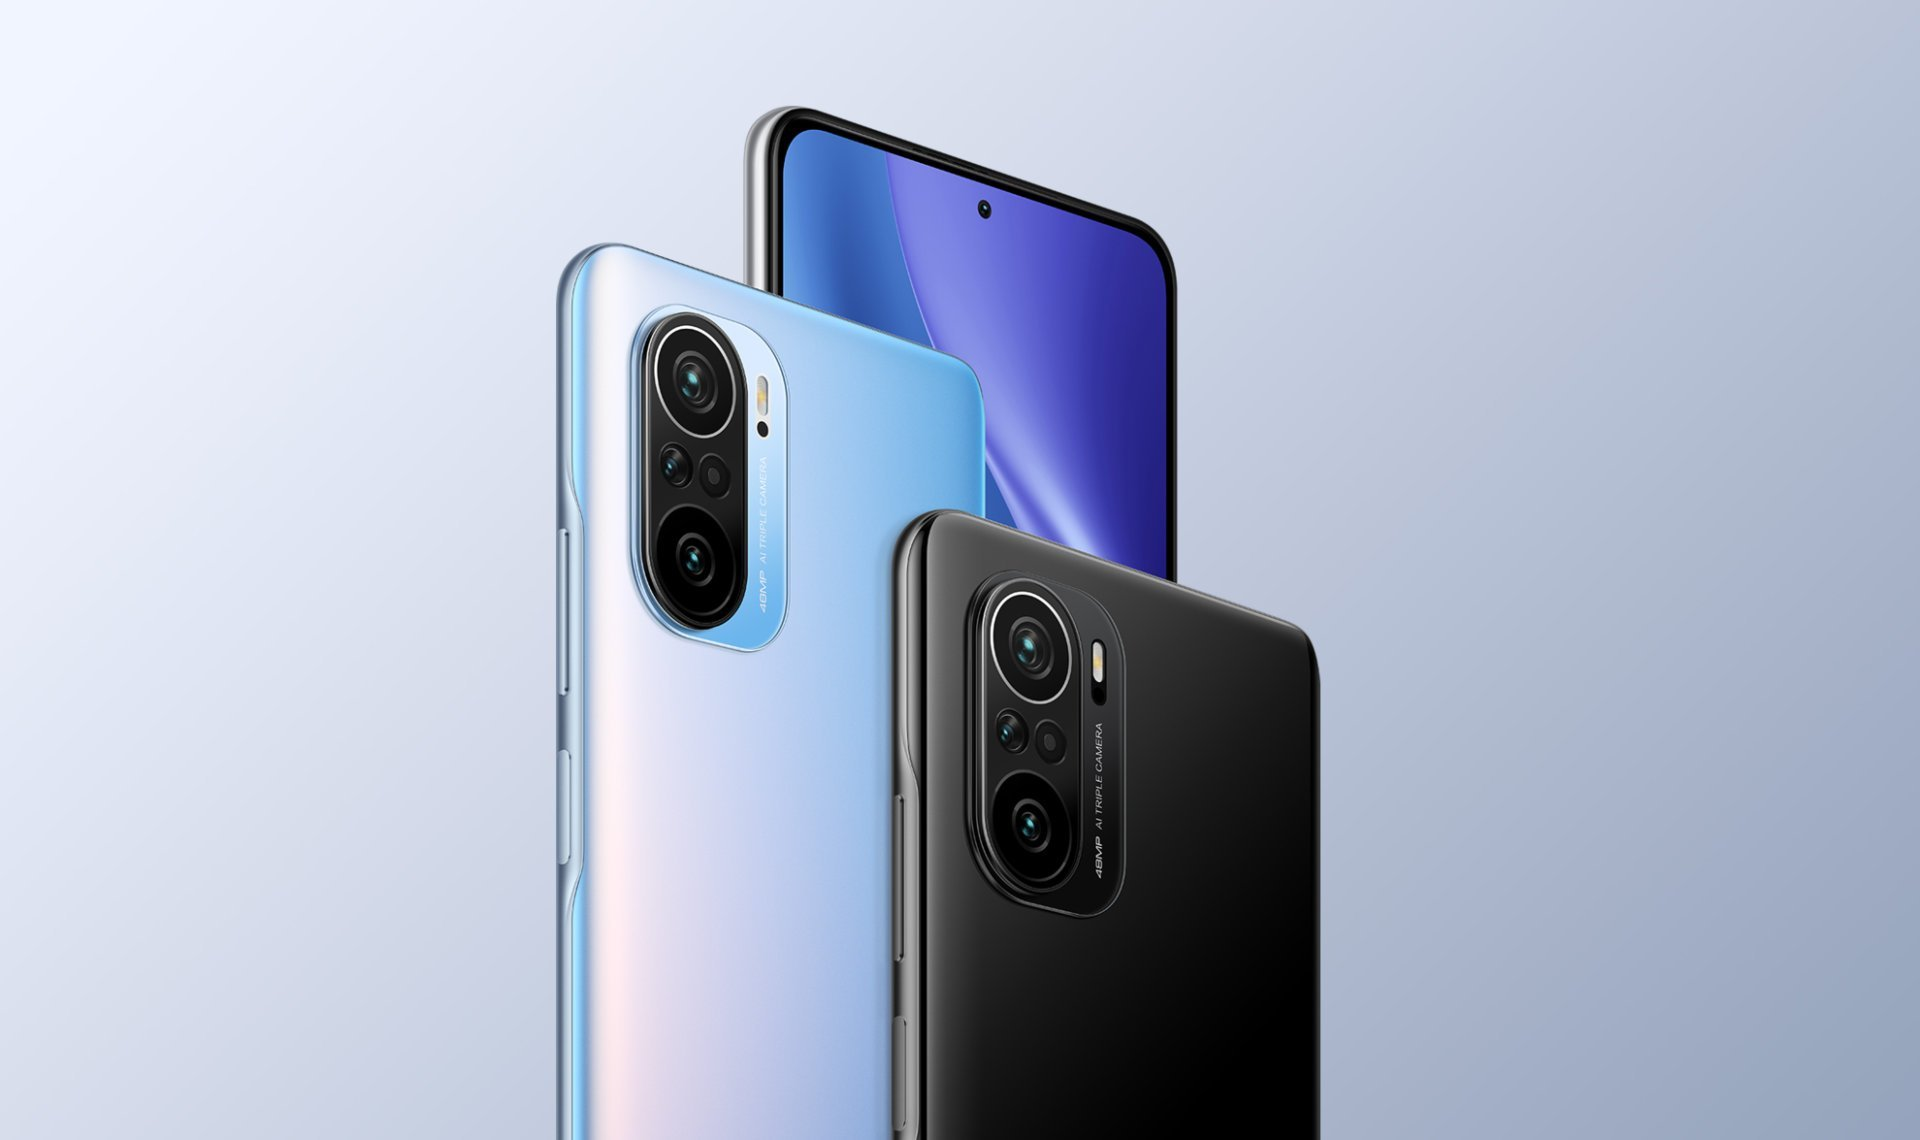 Xiaomi Poco F3 : la version française du Redmi K40 est attendue la semaine prochaine